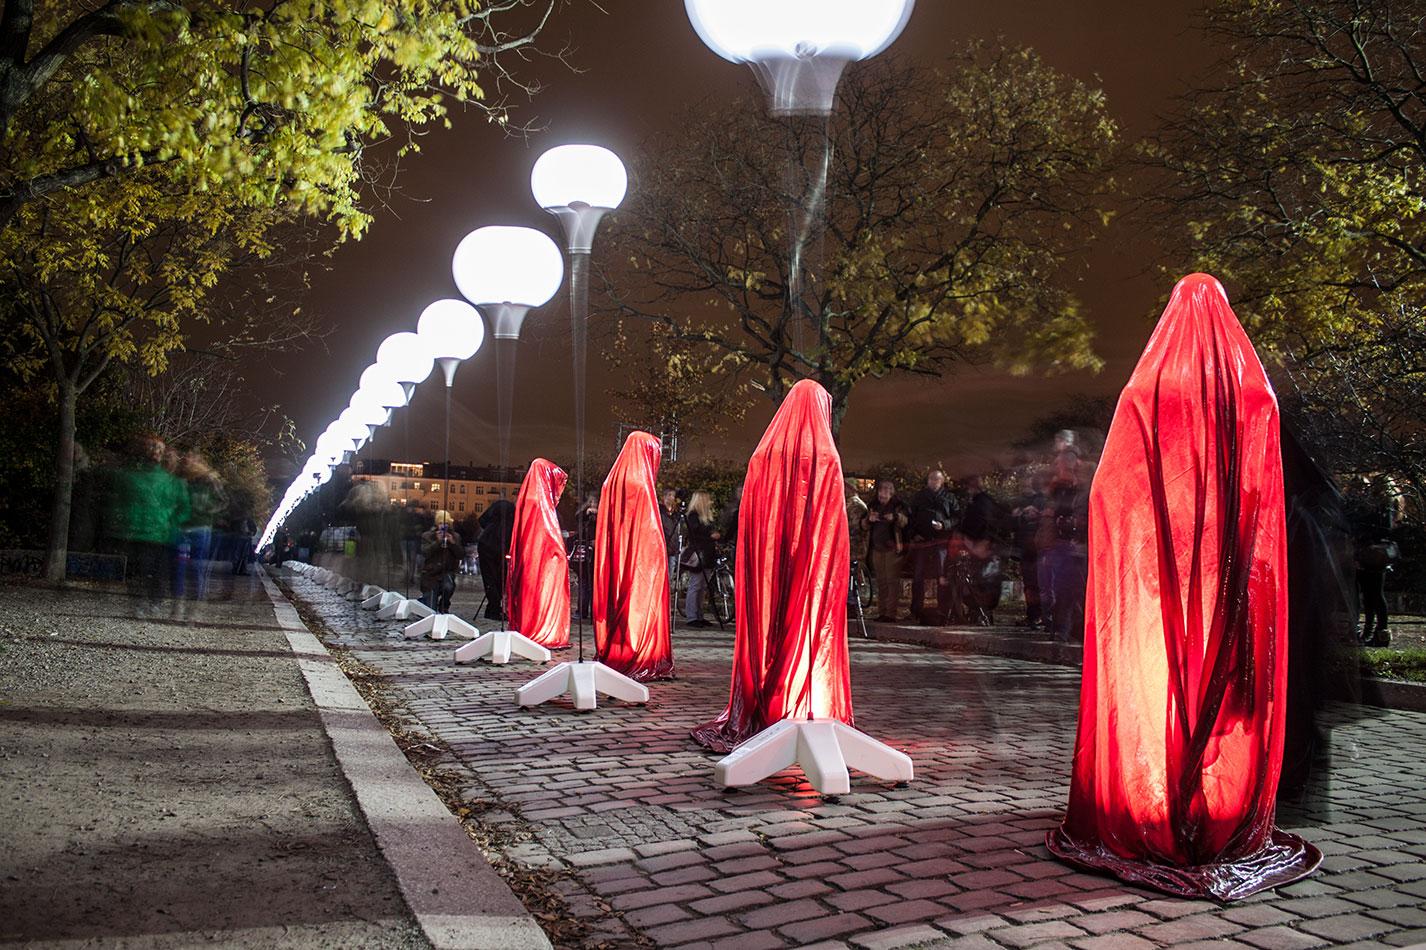 25-years-wallfall-berlin-germany-wallpark-contemporary-fine-art-show-arts-design-guardians-of-time-manfred-kili-kielnhofer-4360